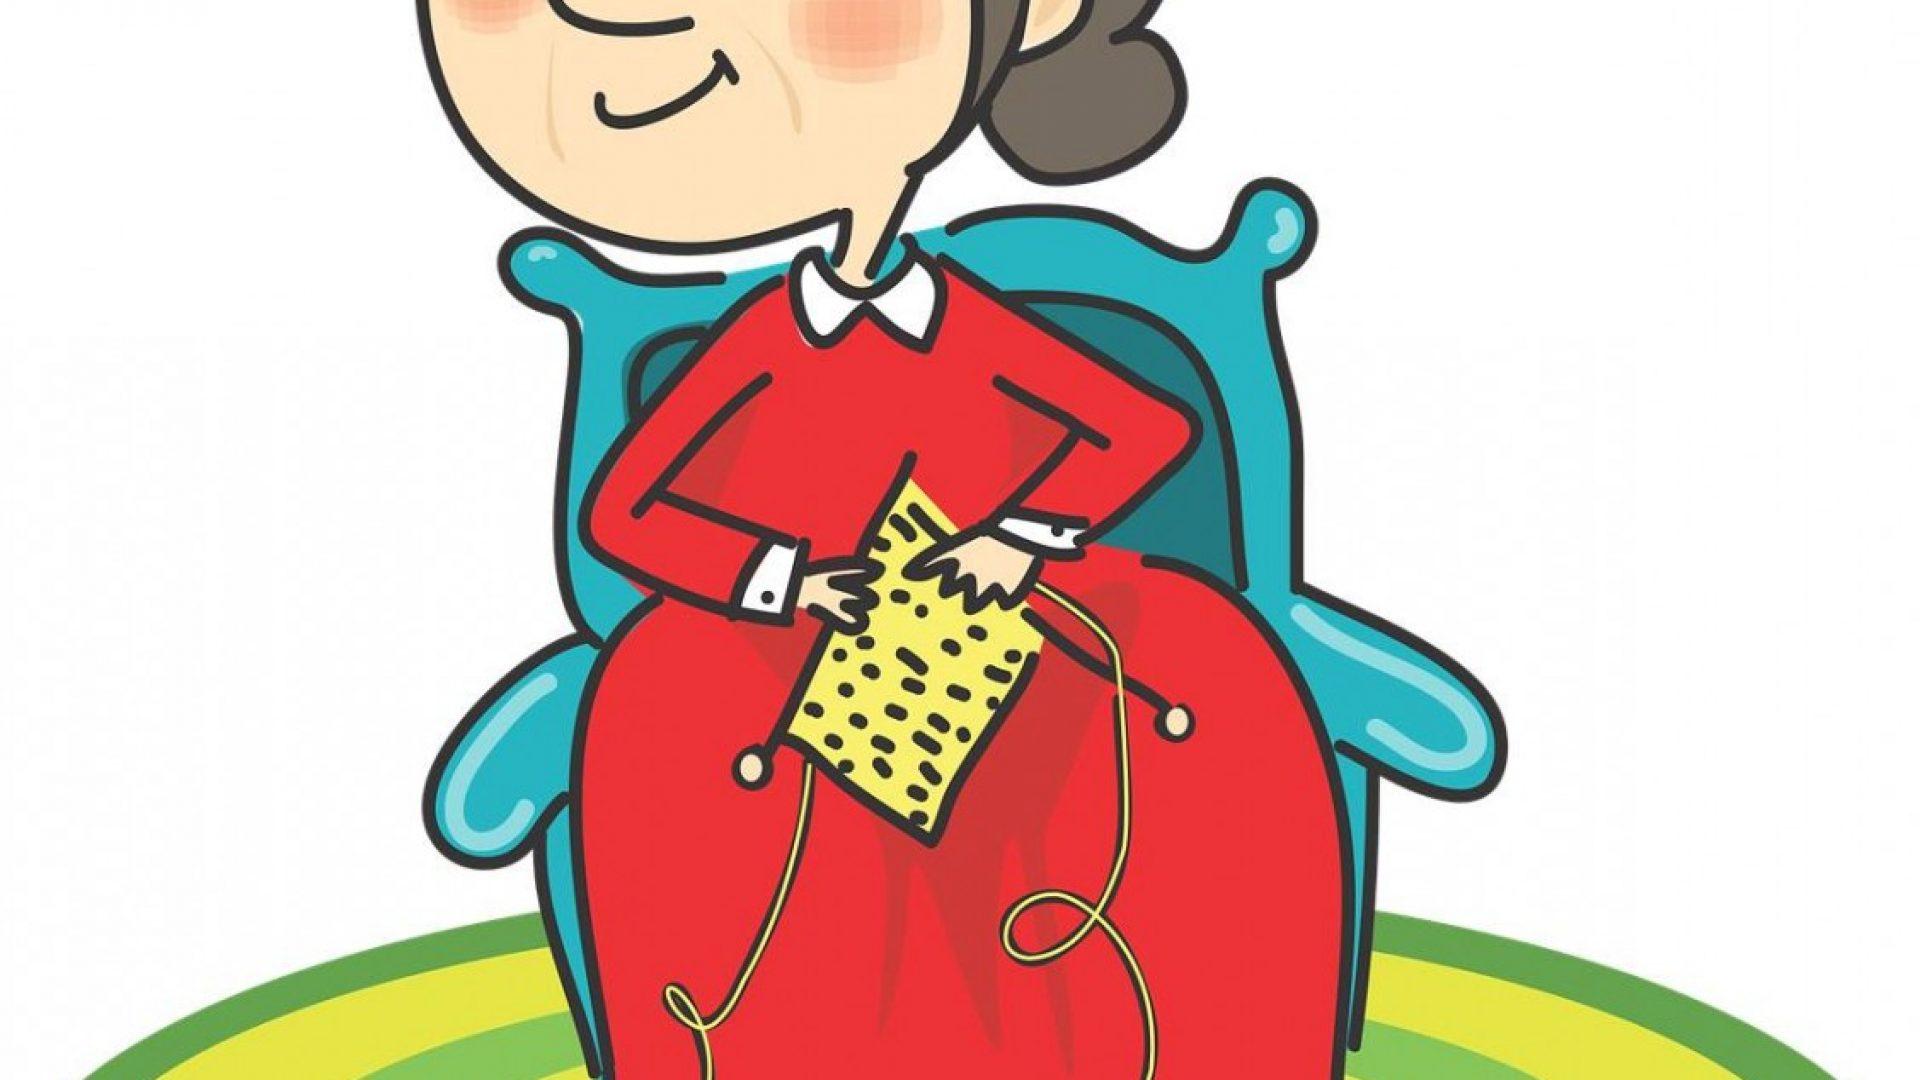 En eldre dame med strikketøy i hånden